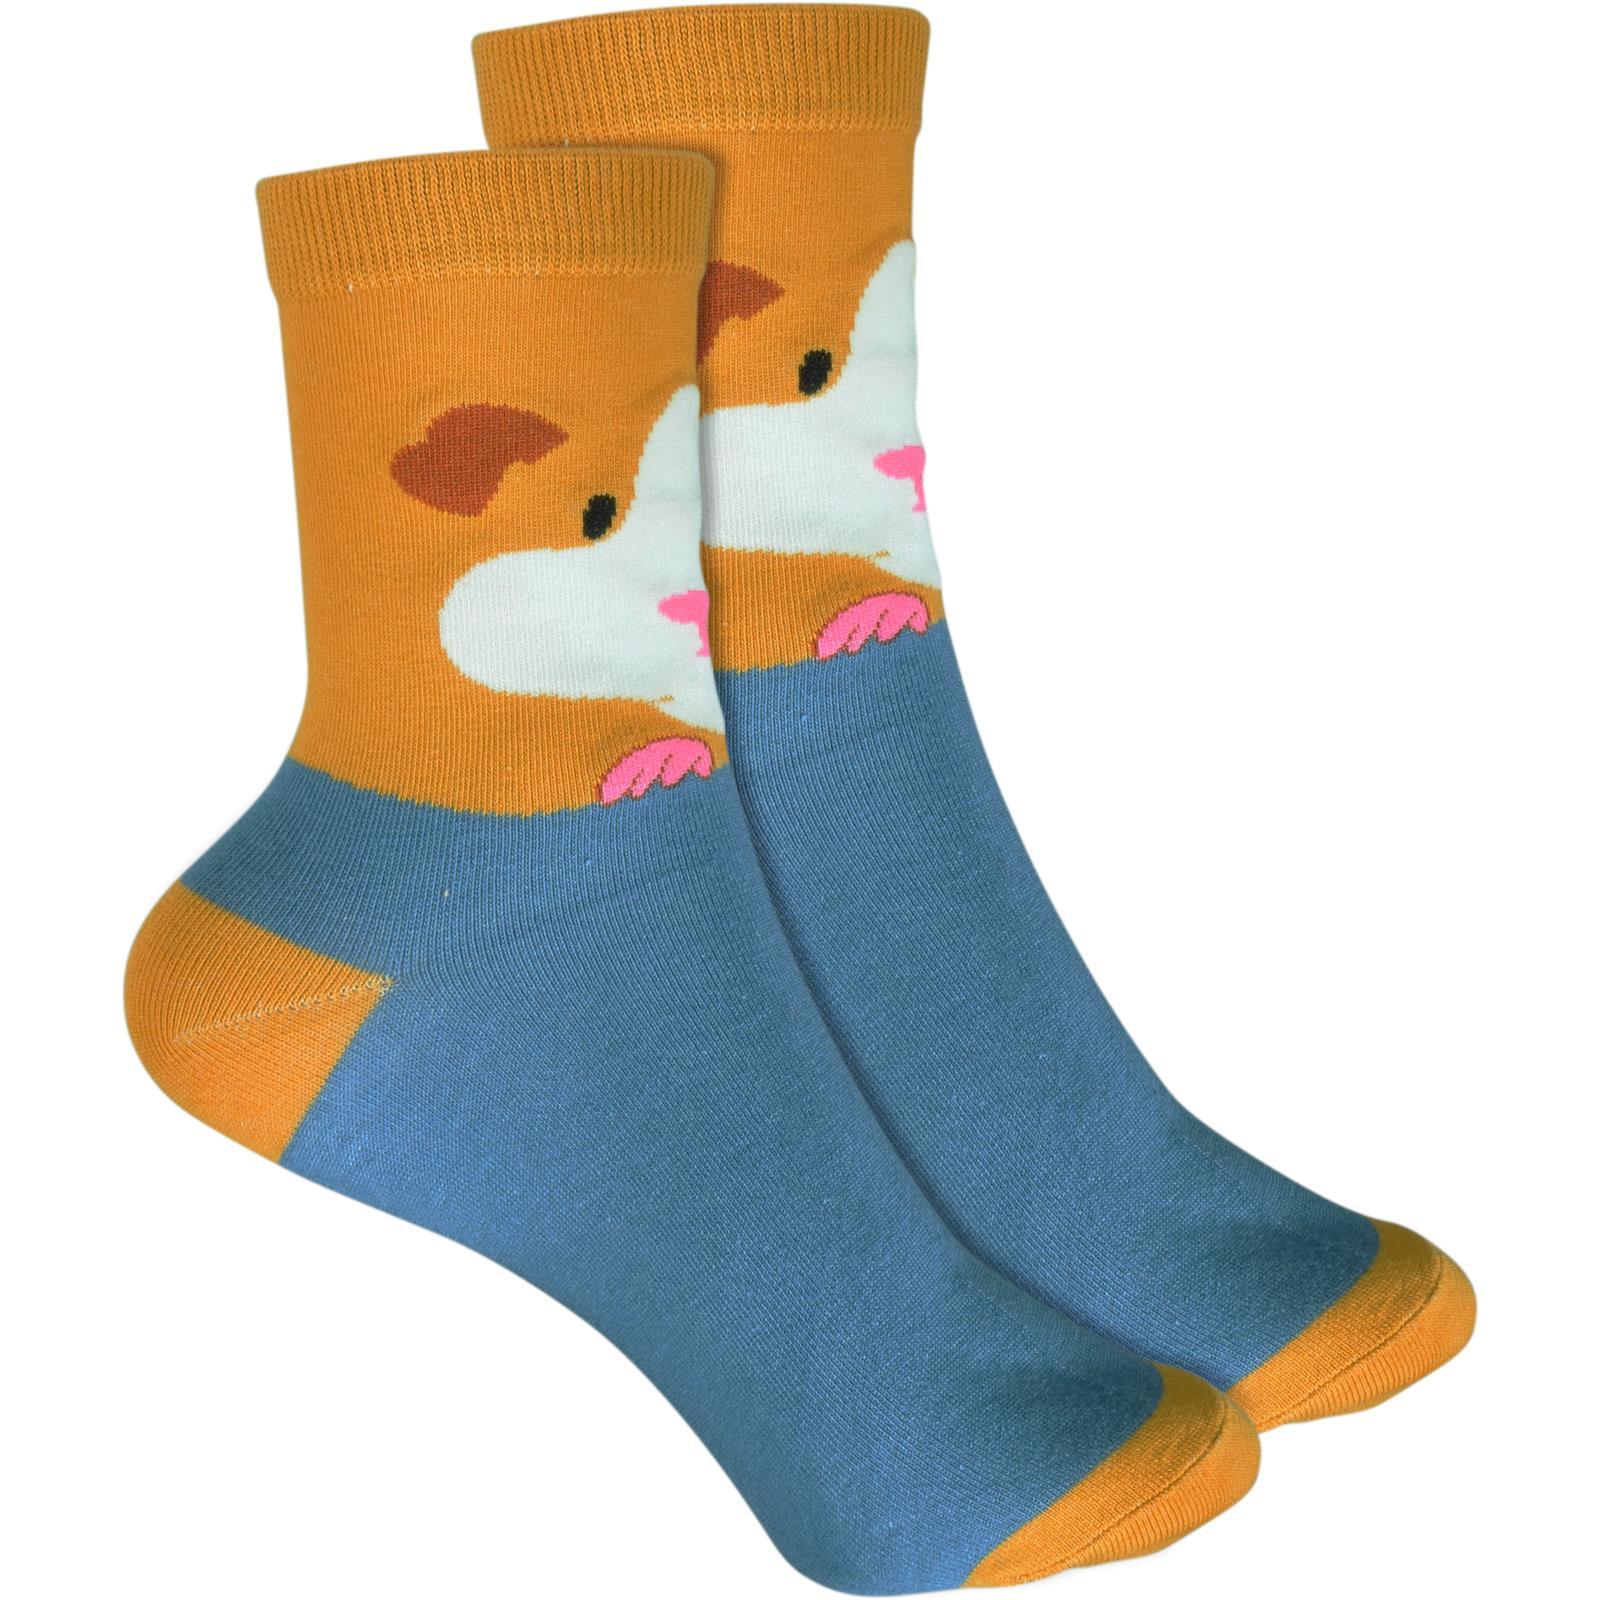 Meerschweinchen blau cosey dünne Socken 2 Paar Baumwolle atmungsaktiv 33-40